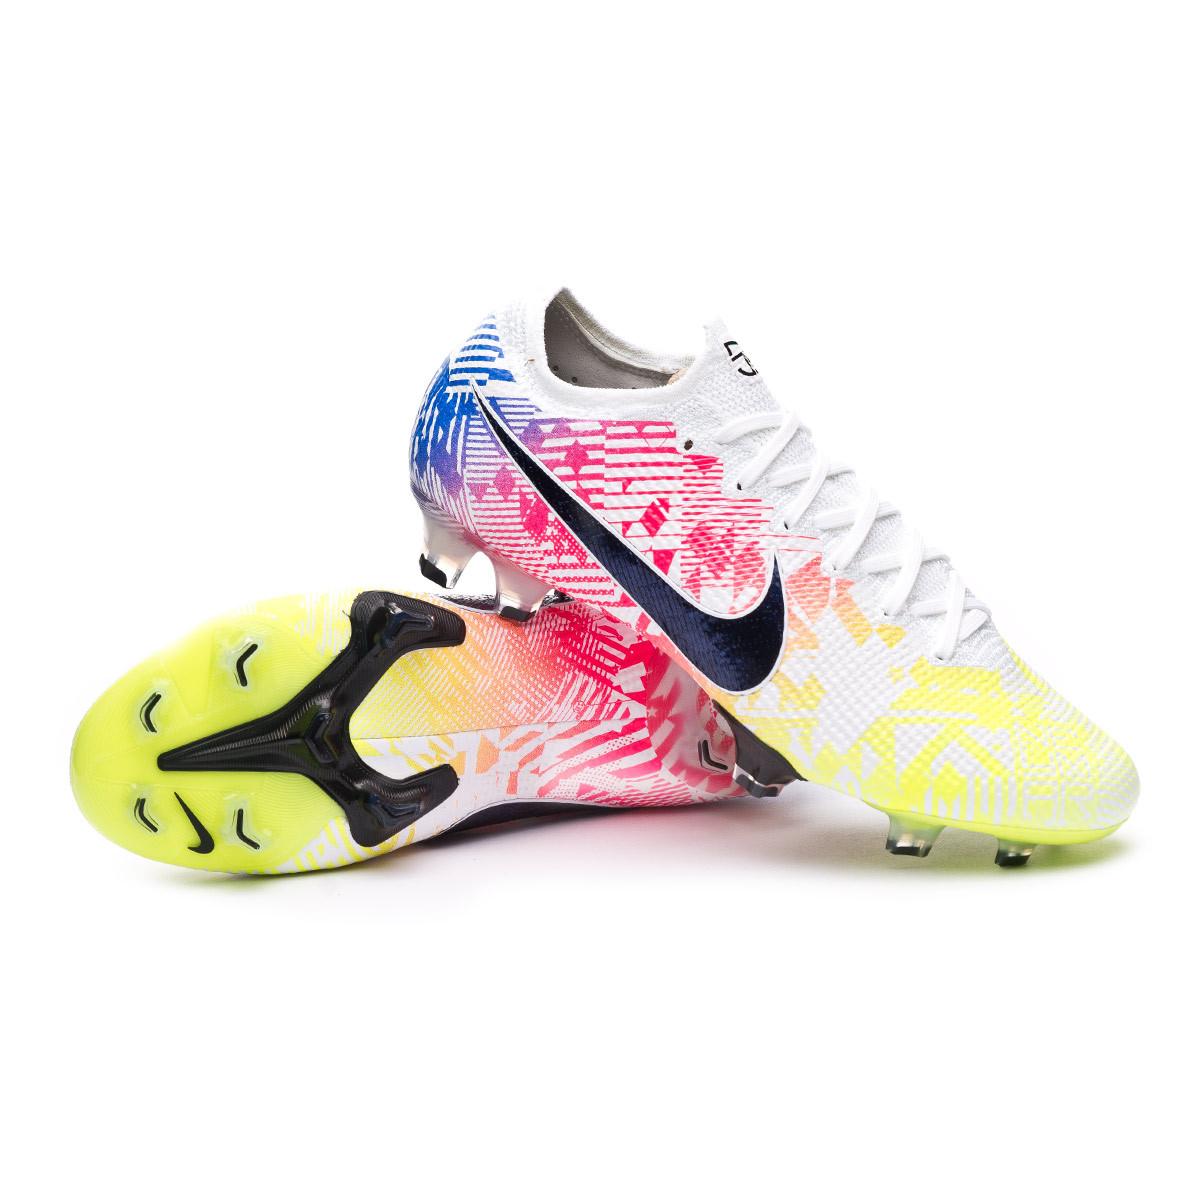 Chaussure de foot Nike Mercurial Vapor XIII Elite Neymar Jr FG ...